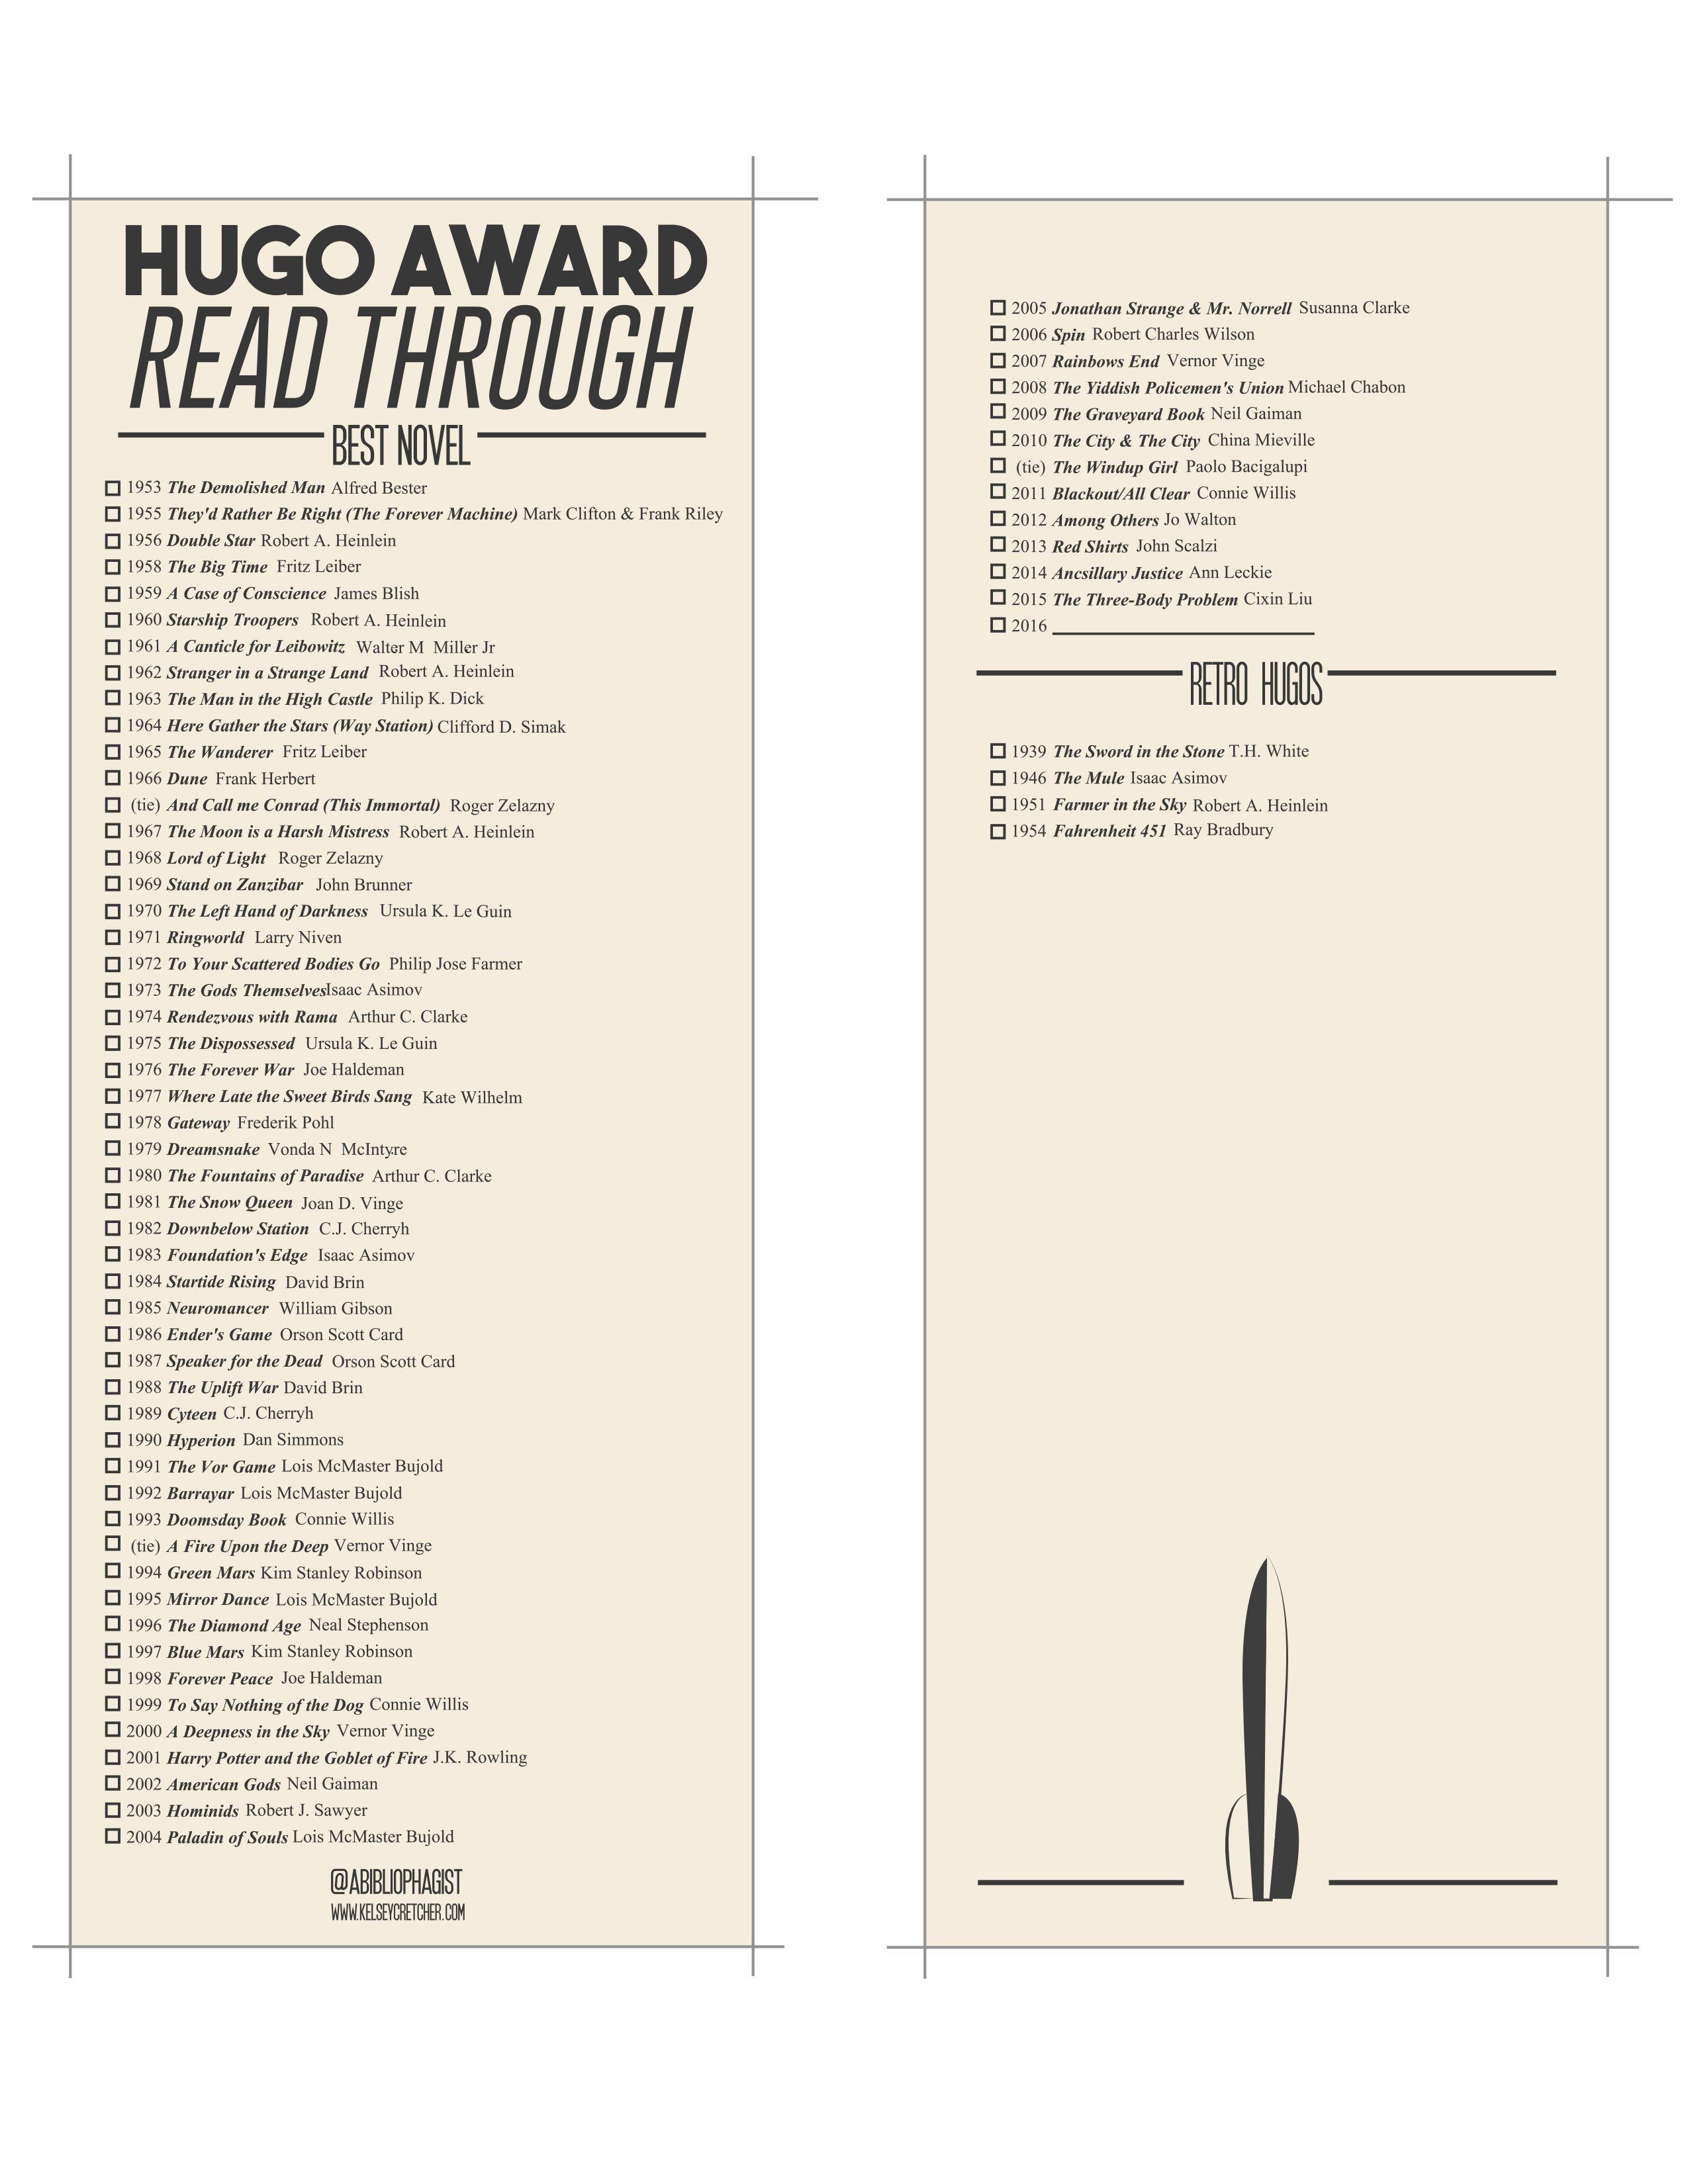 Hugo Award Checklist | Writing | Best novels, Awards, Novels